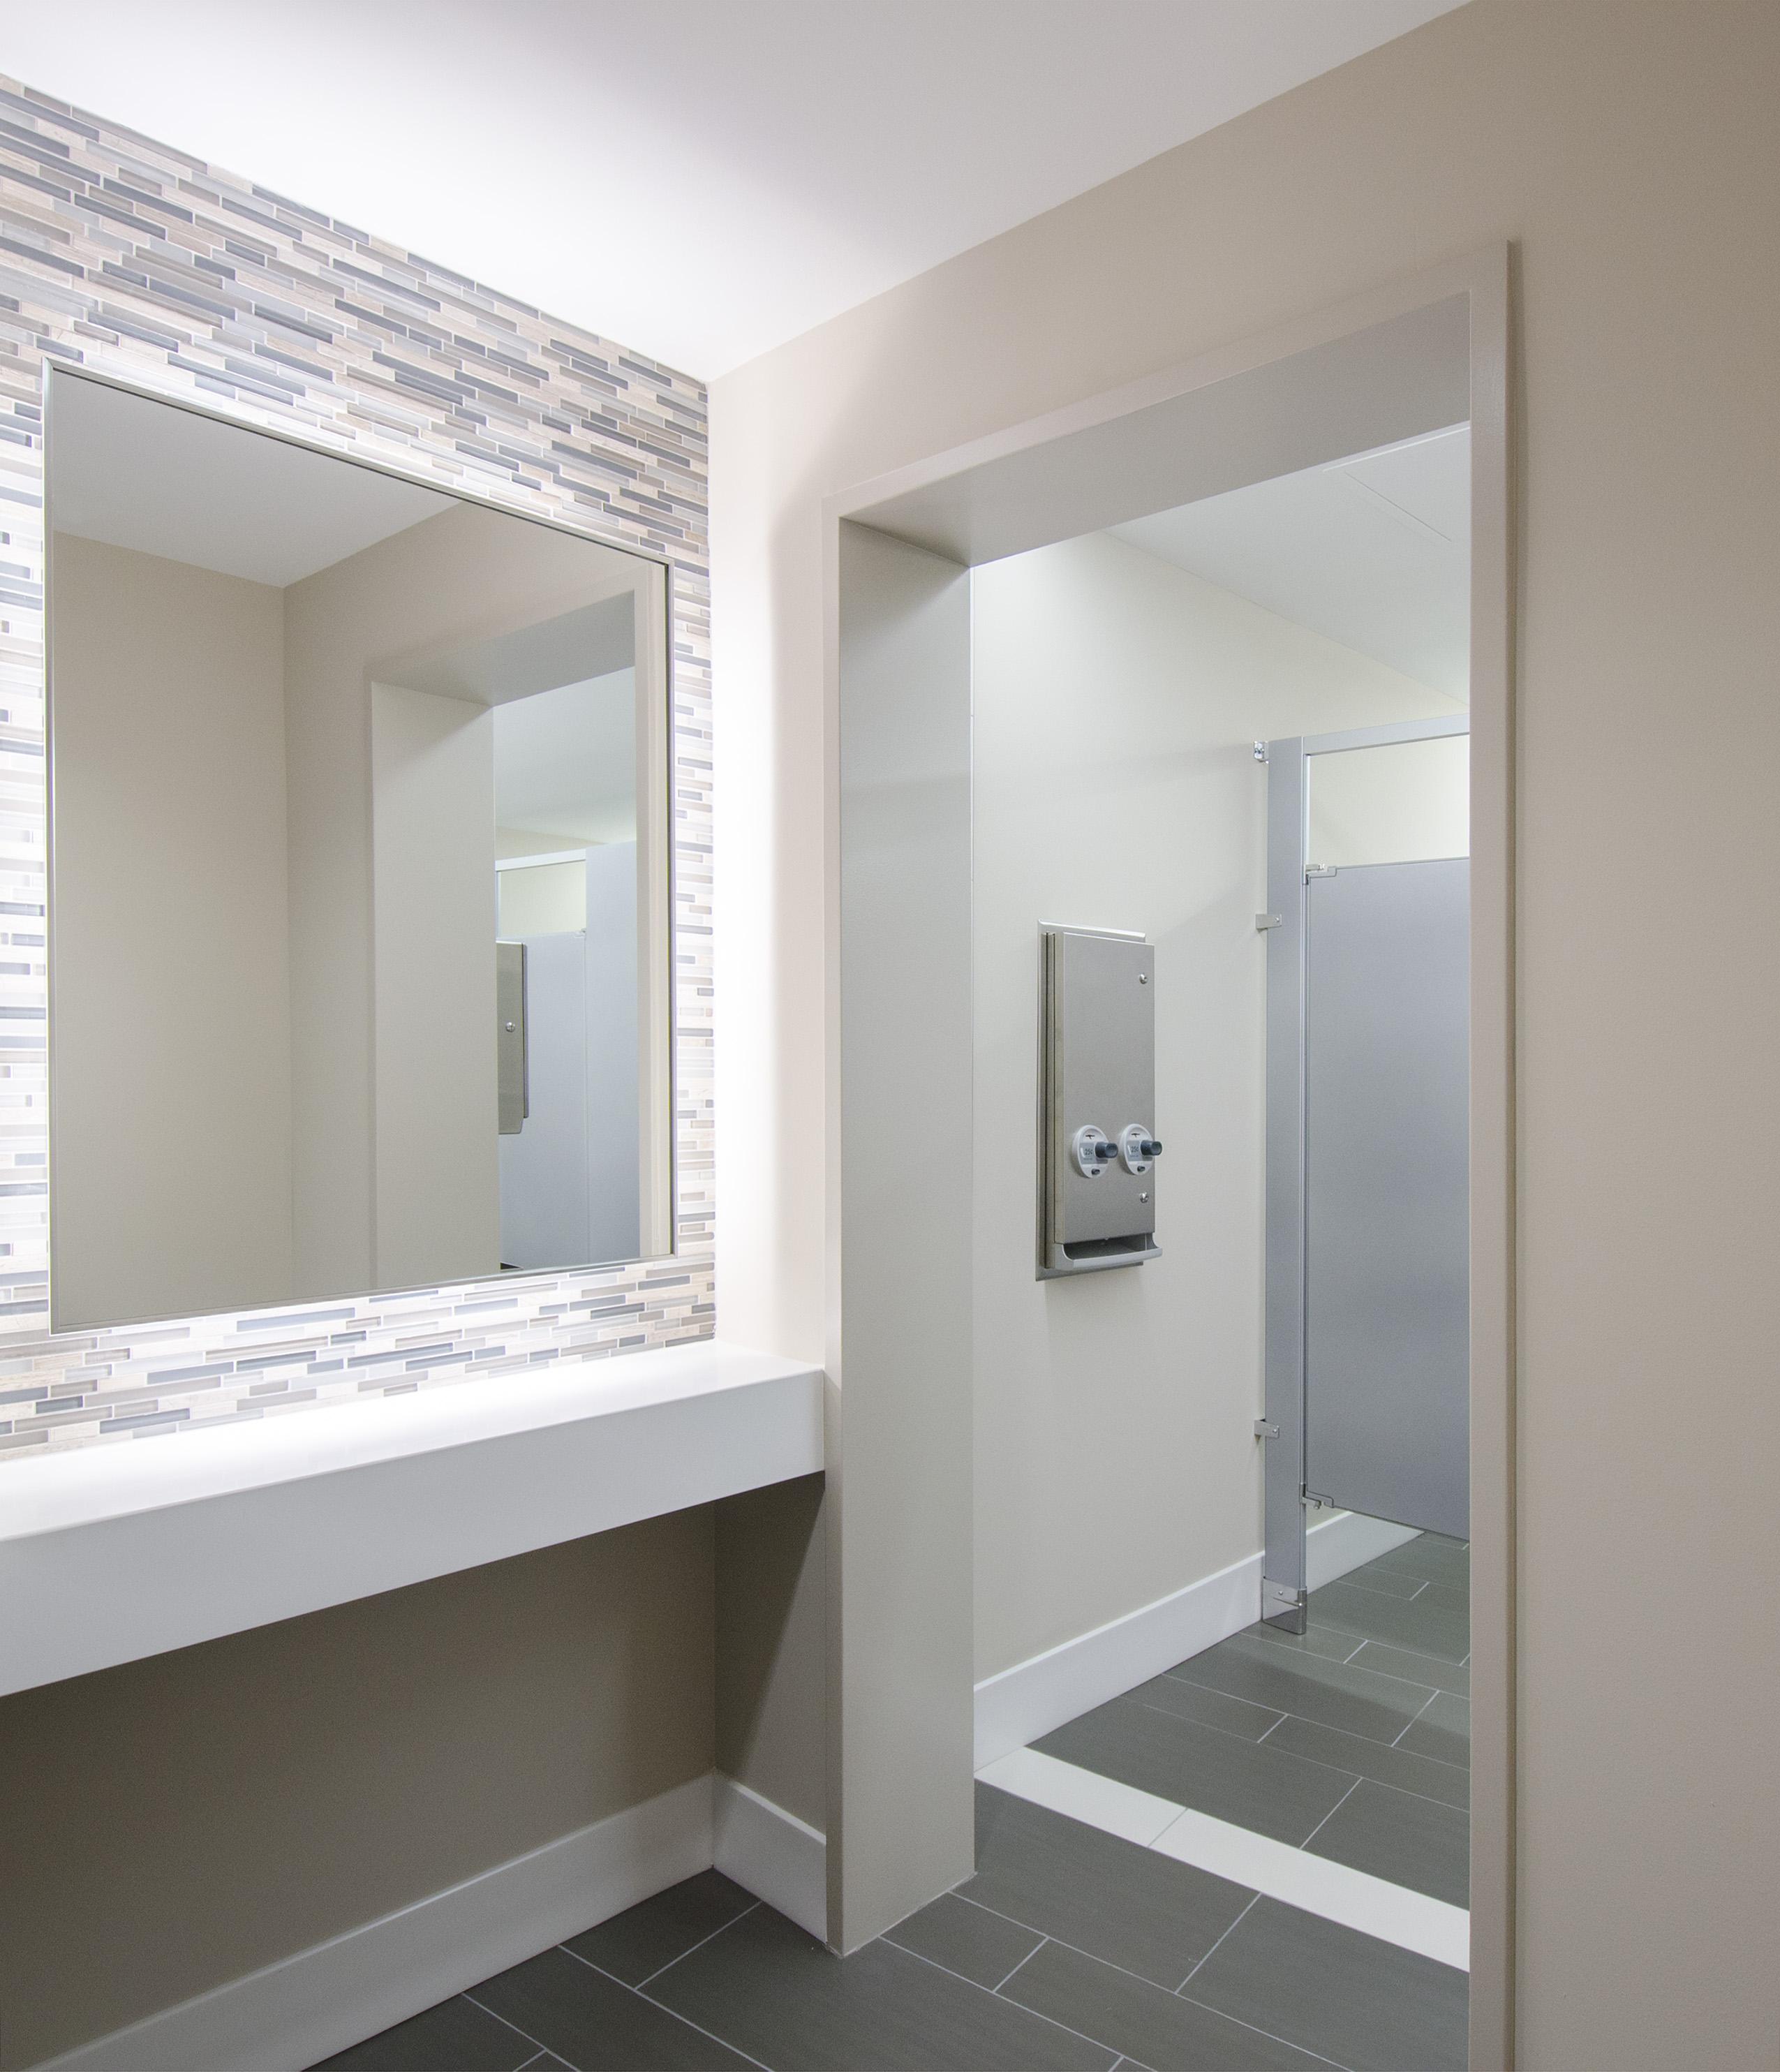 Troiano Enterprises, Inc. - Commercial Bathrooms Images | ProView